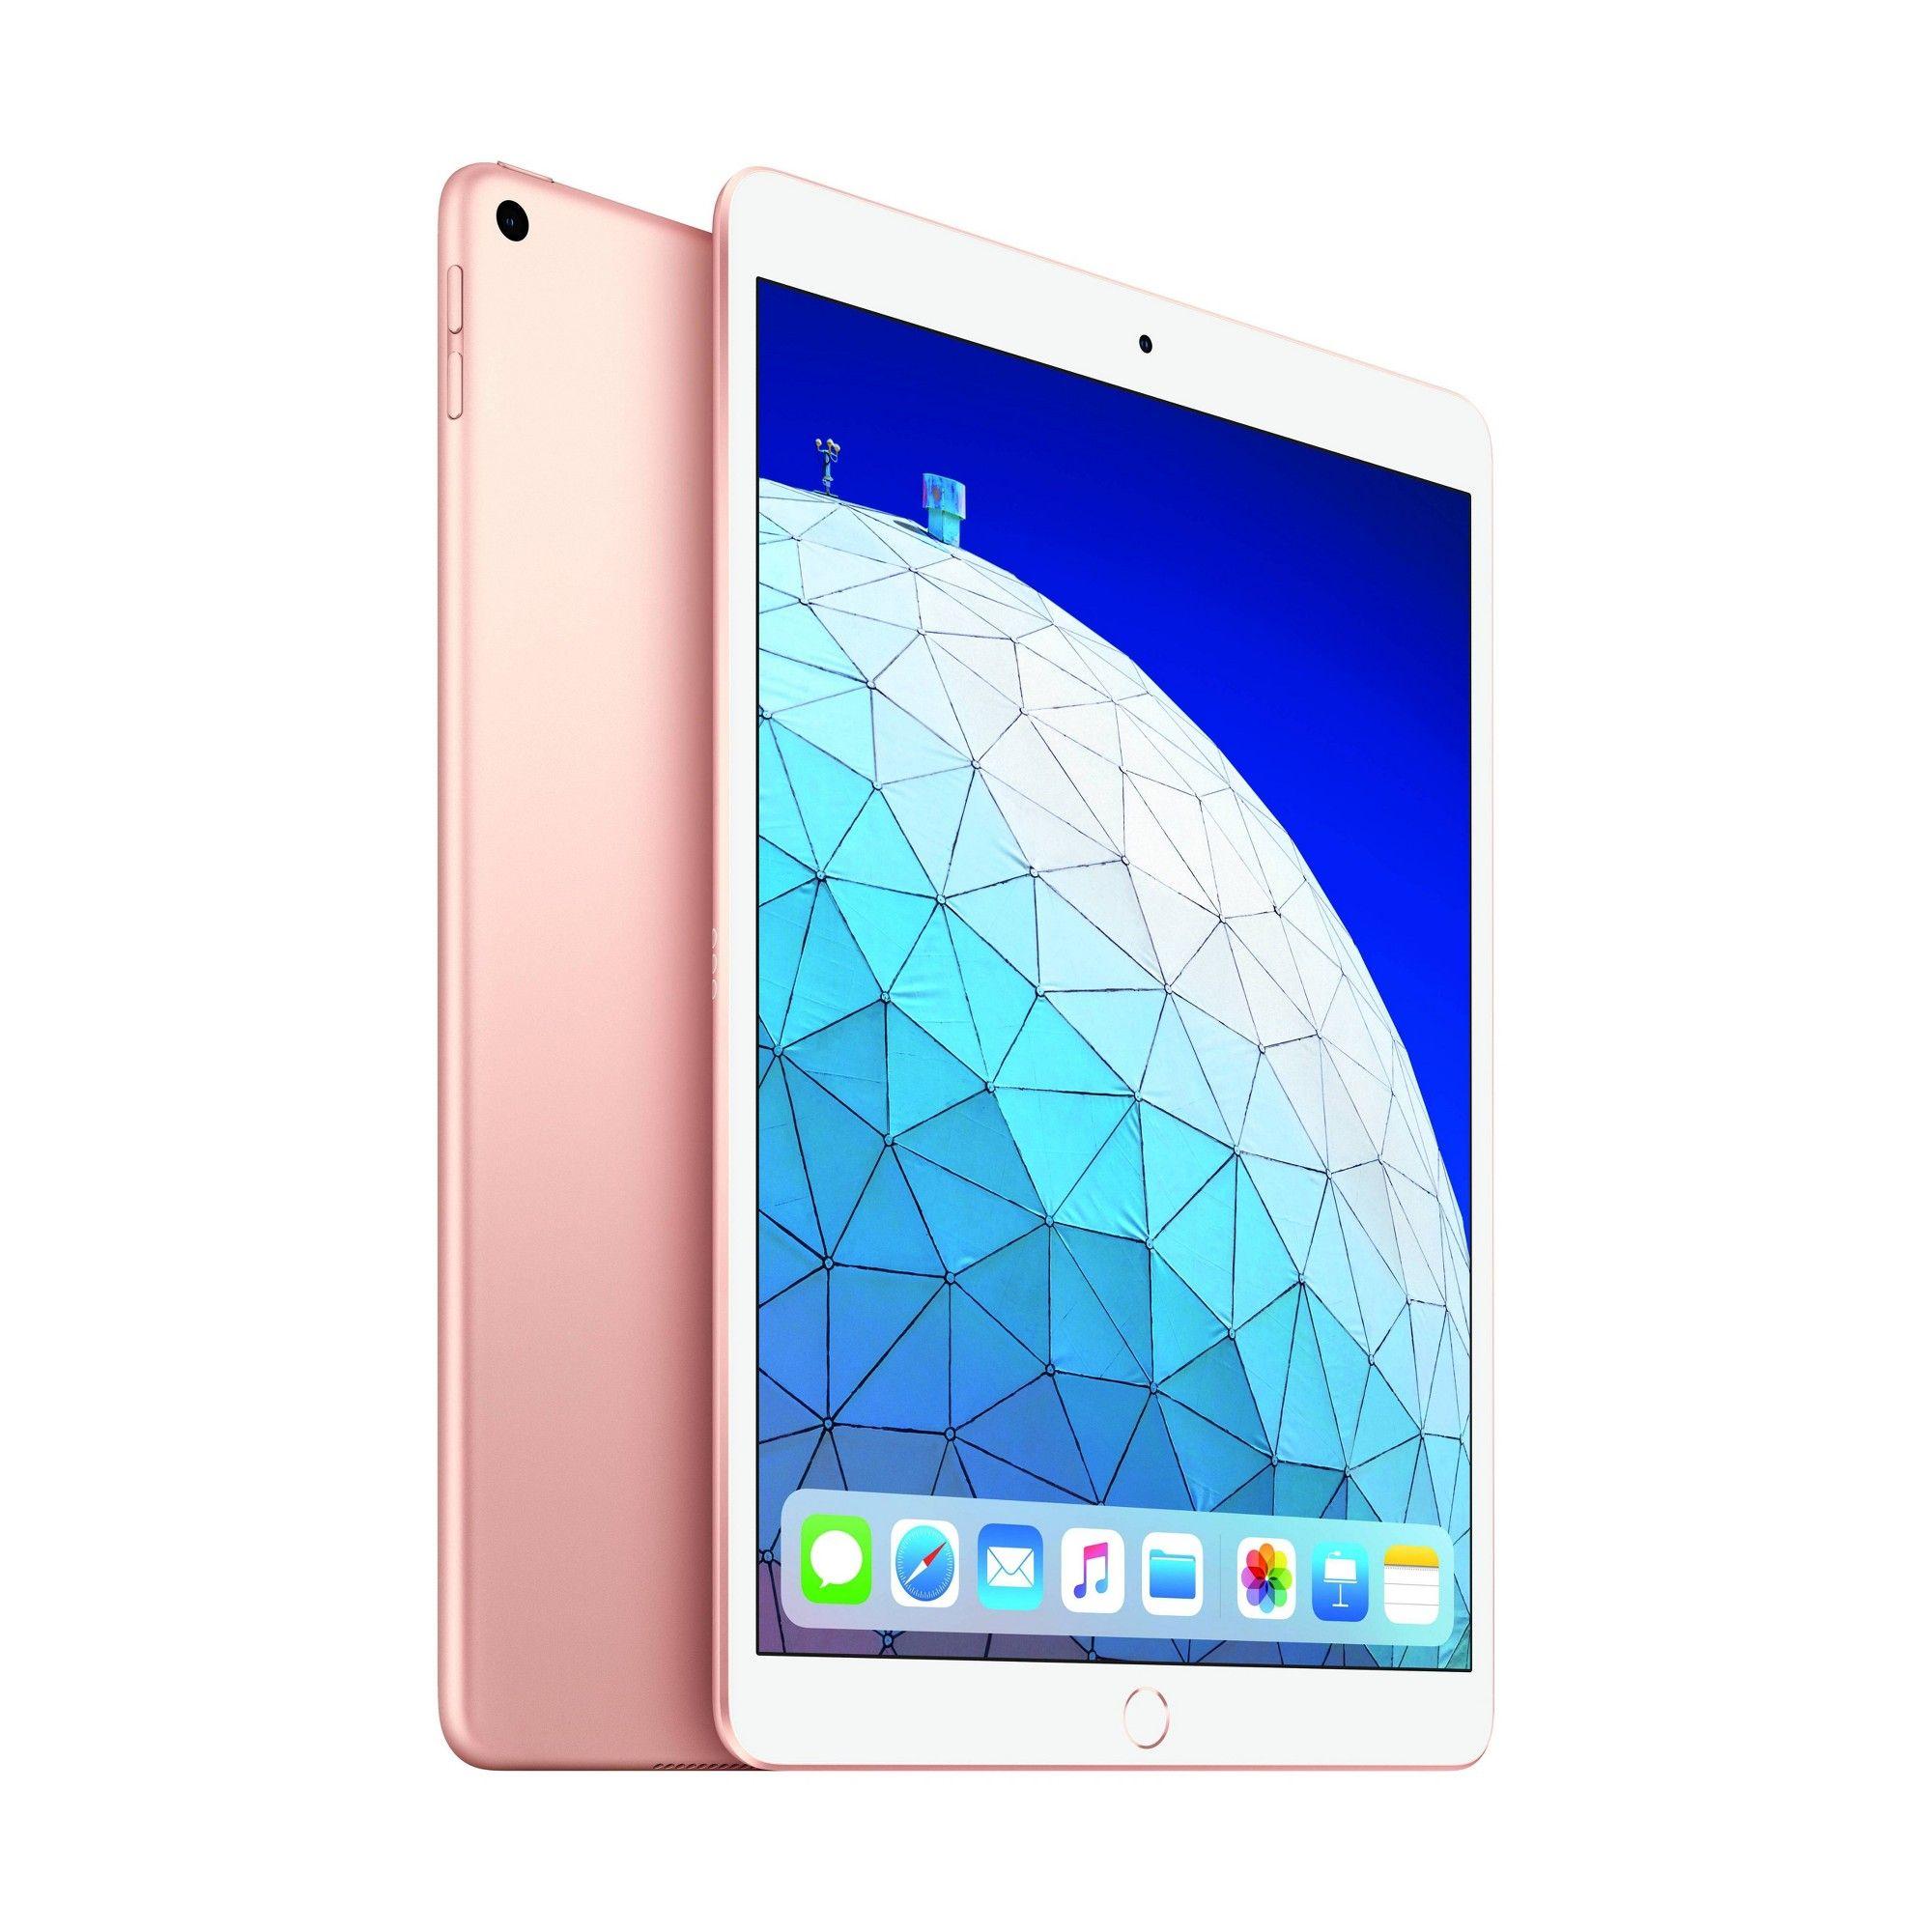 Apple iPad Air 10.5inch 64GB WiFi Only (2019 Model